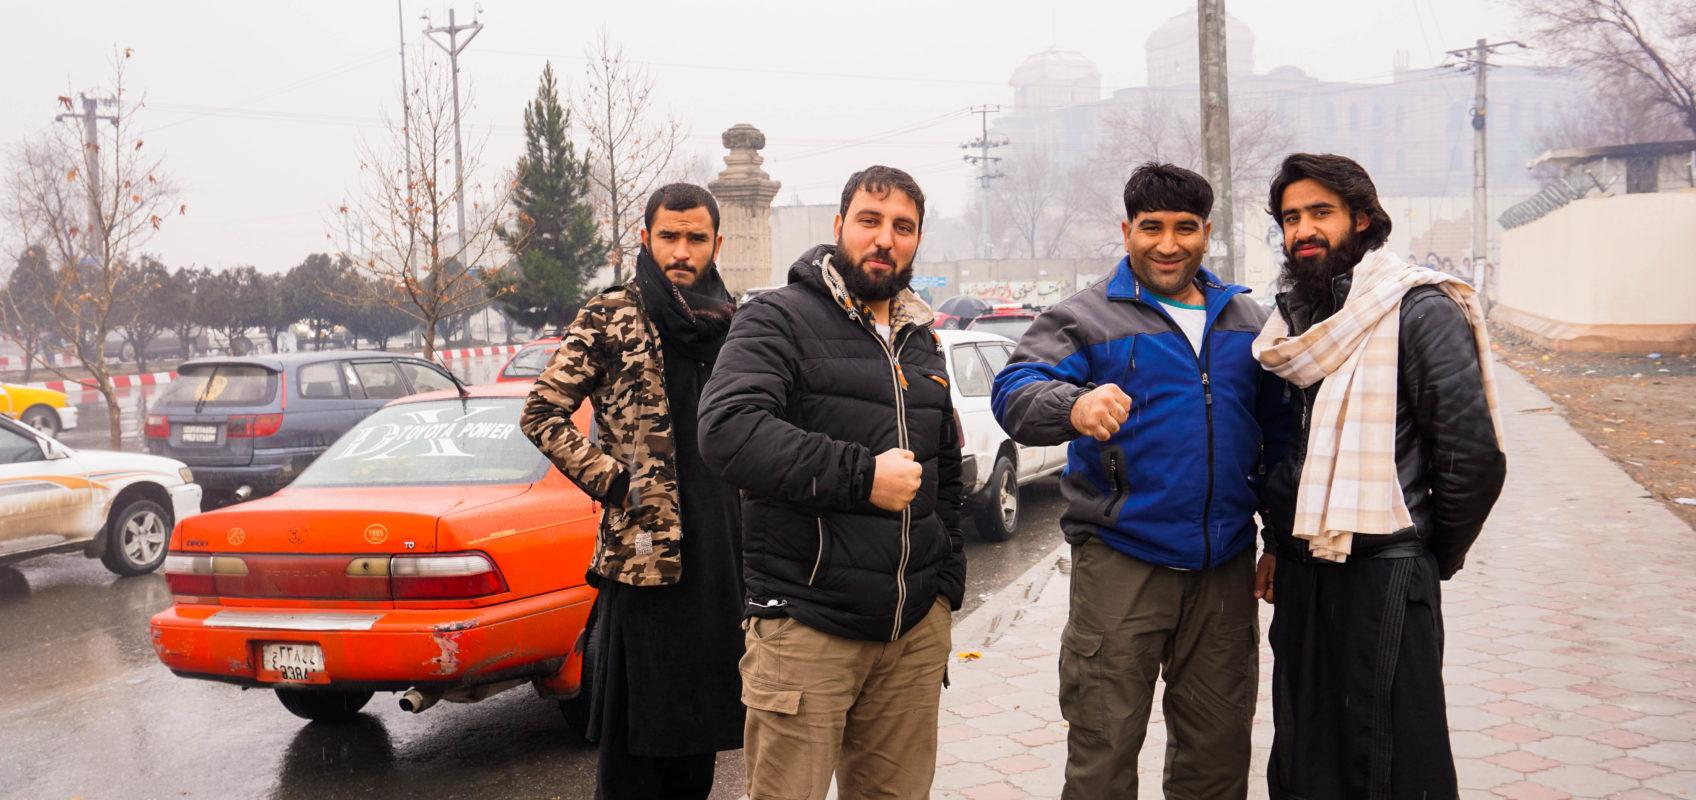 We cut short our Afghanistan trip   The Rantau Wanderer